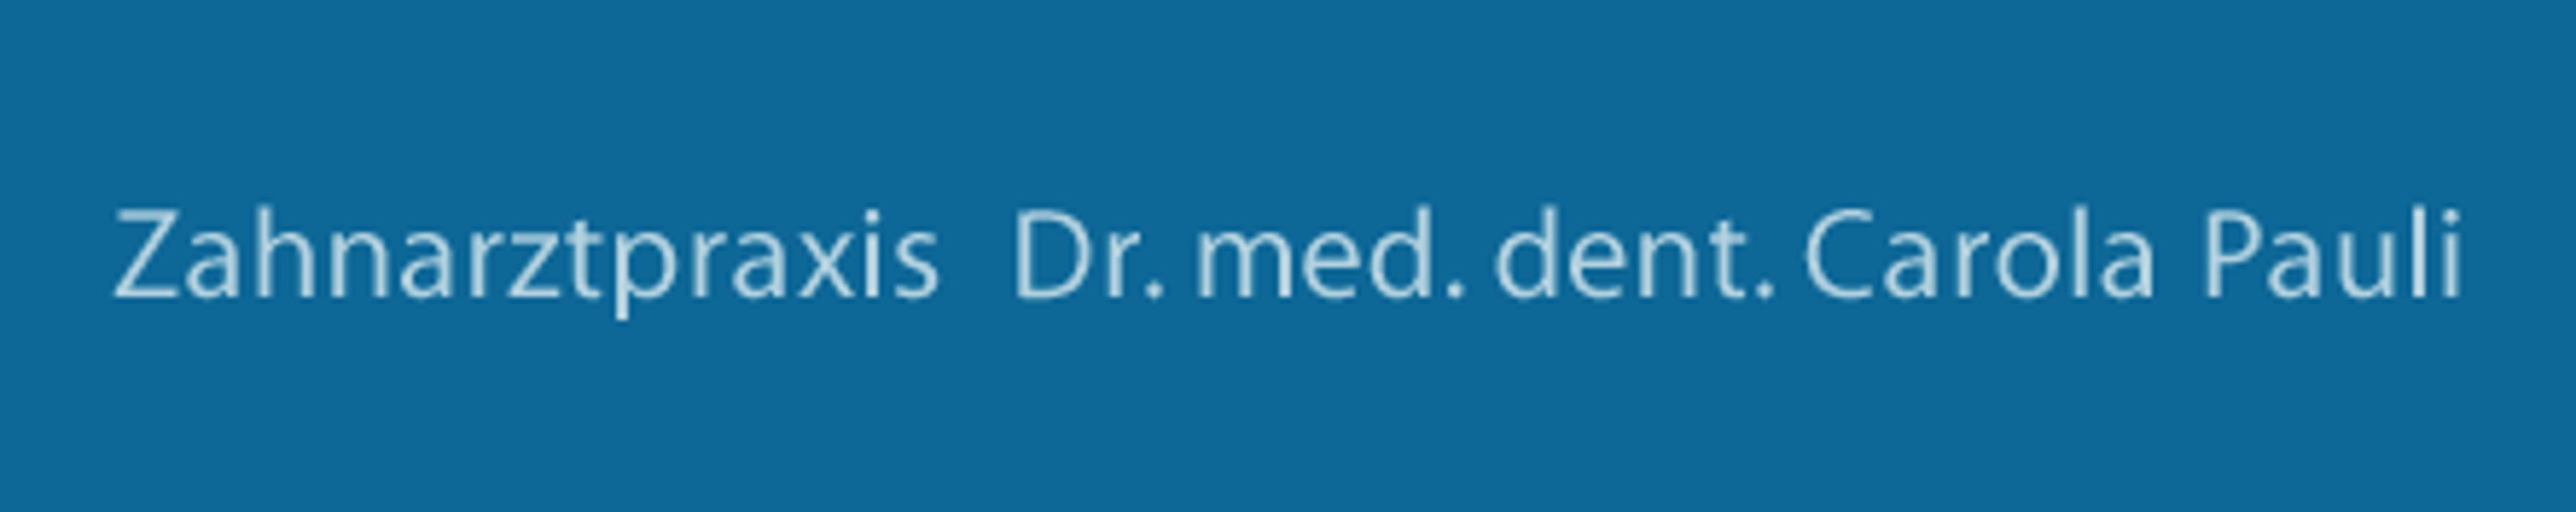 Bild zu Zahnarztpraxis Dr. med. dent. Carola Pauli in Berlin